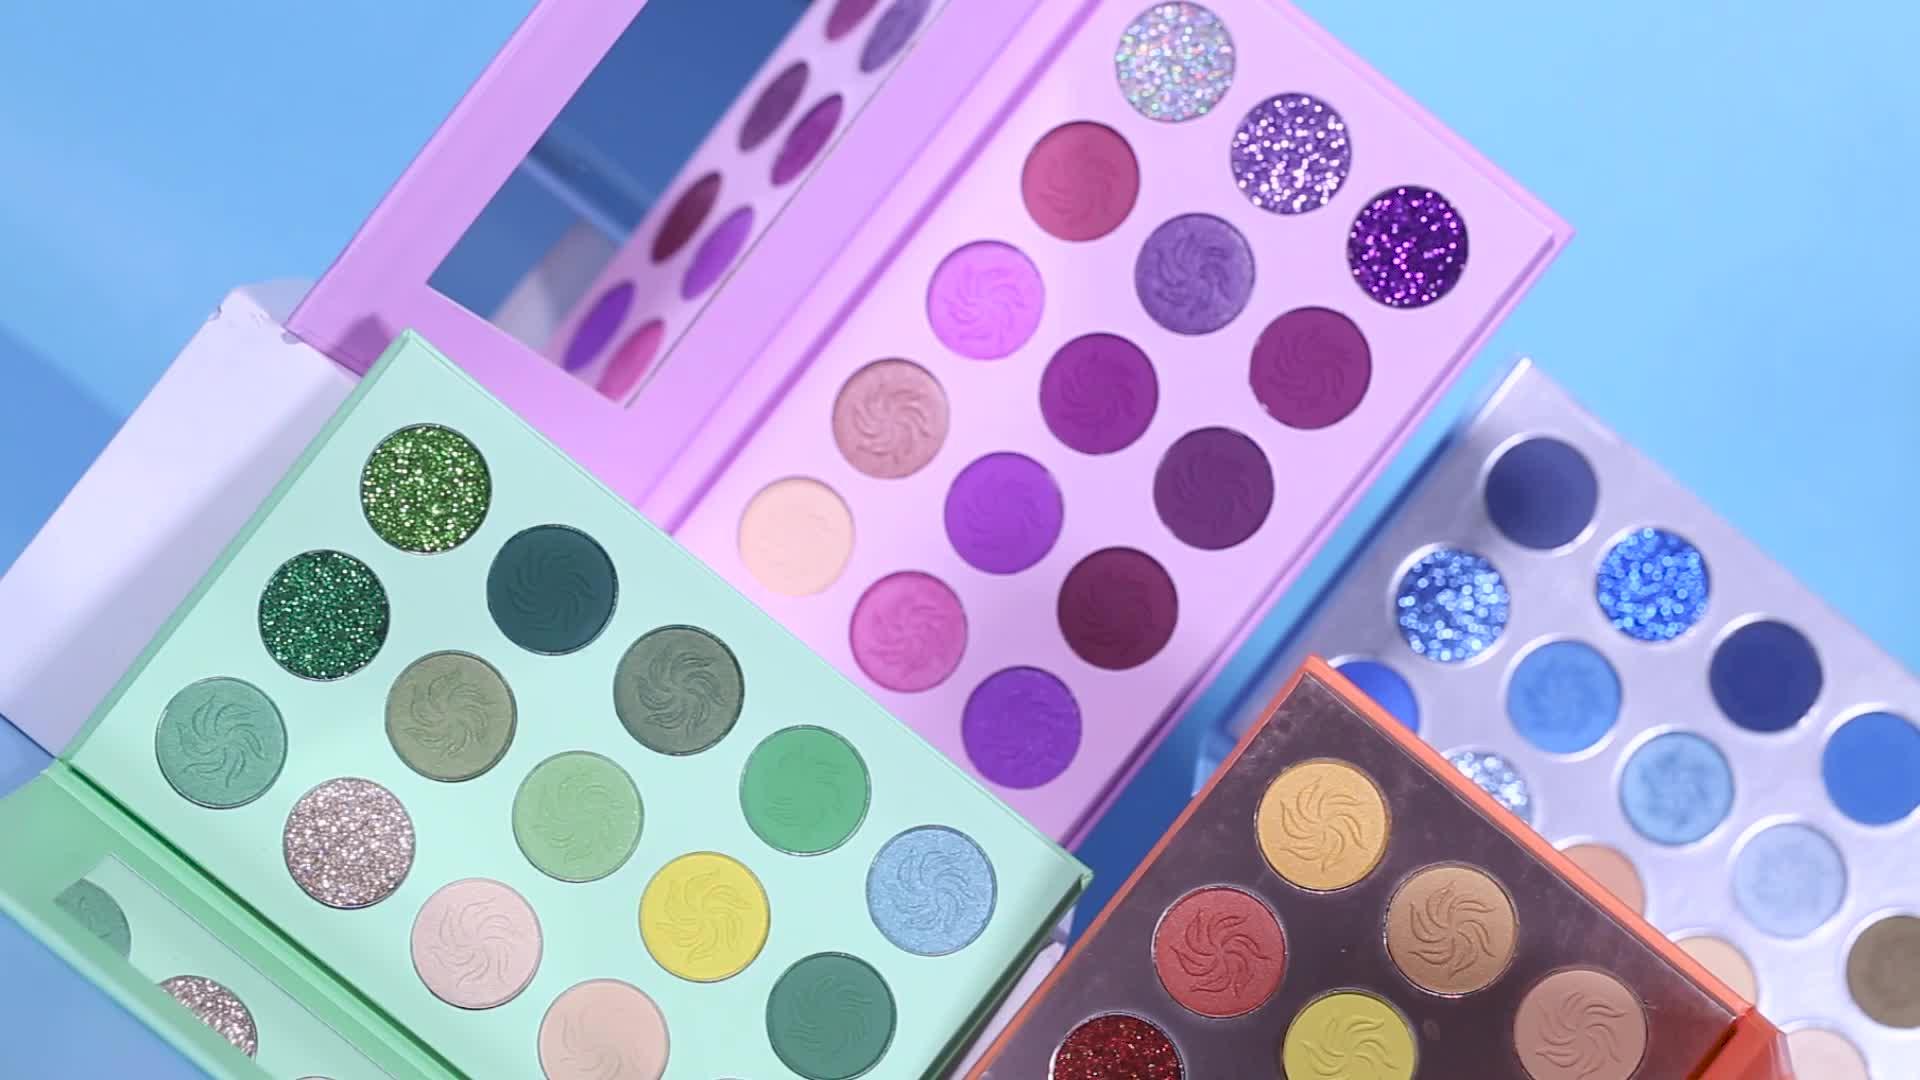 Grosir Kustom Kosmetik Custom Eye Shadow Pallet Pigmen Yang Tinggi Krim Private Label Eyeshadow Palet